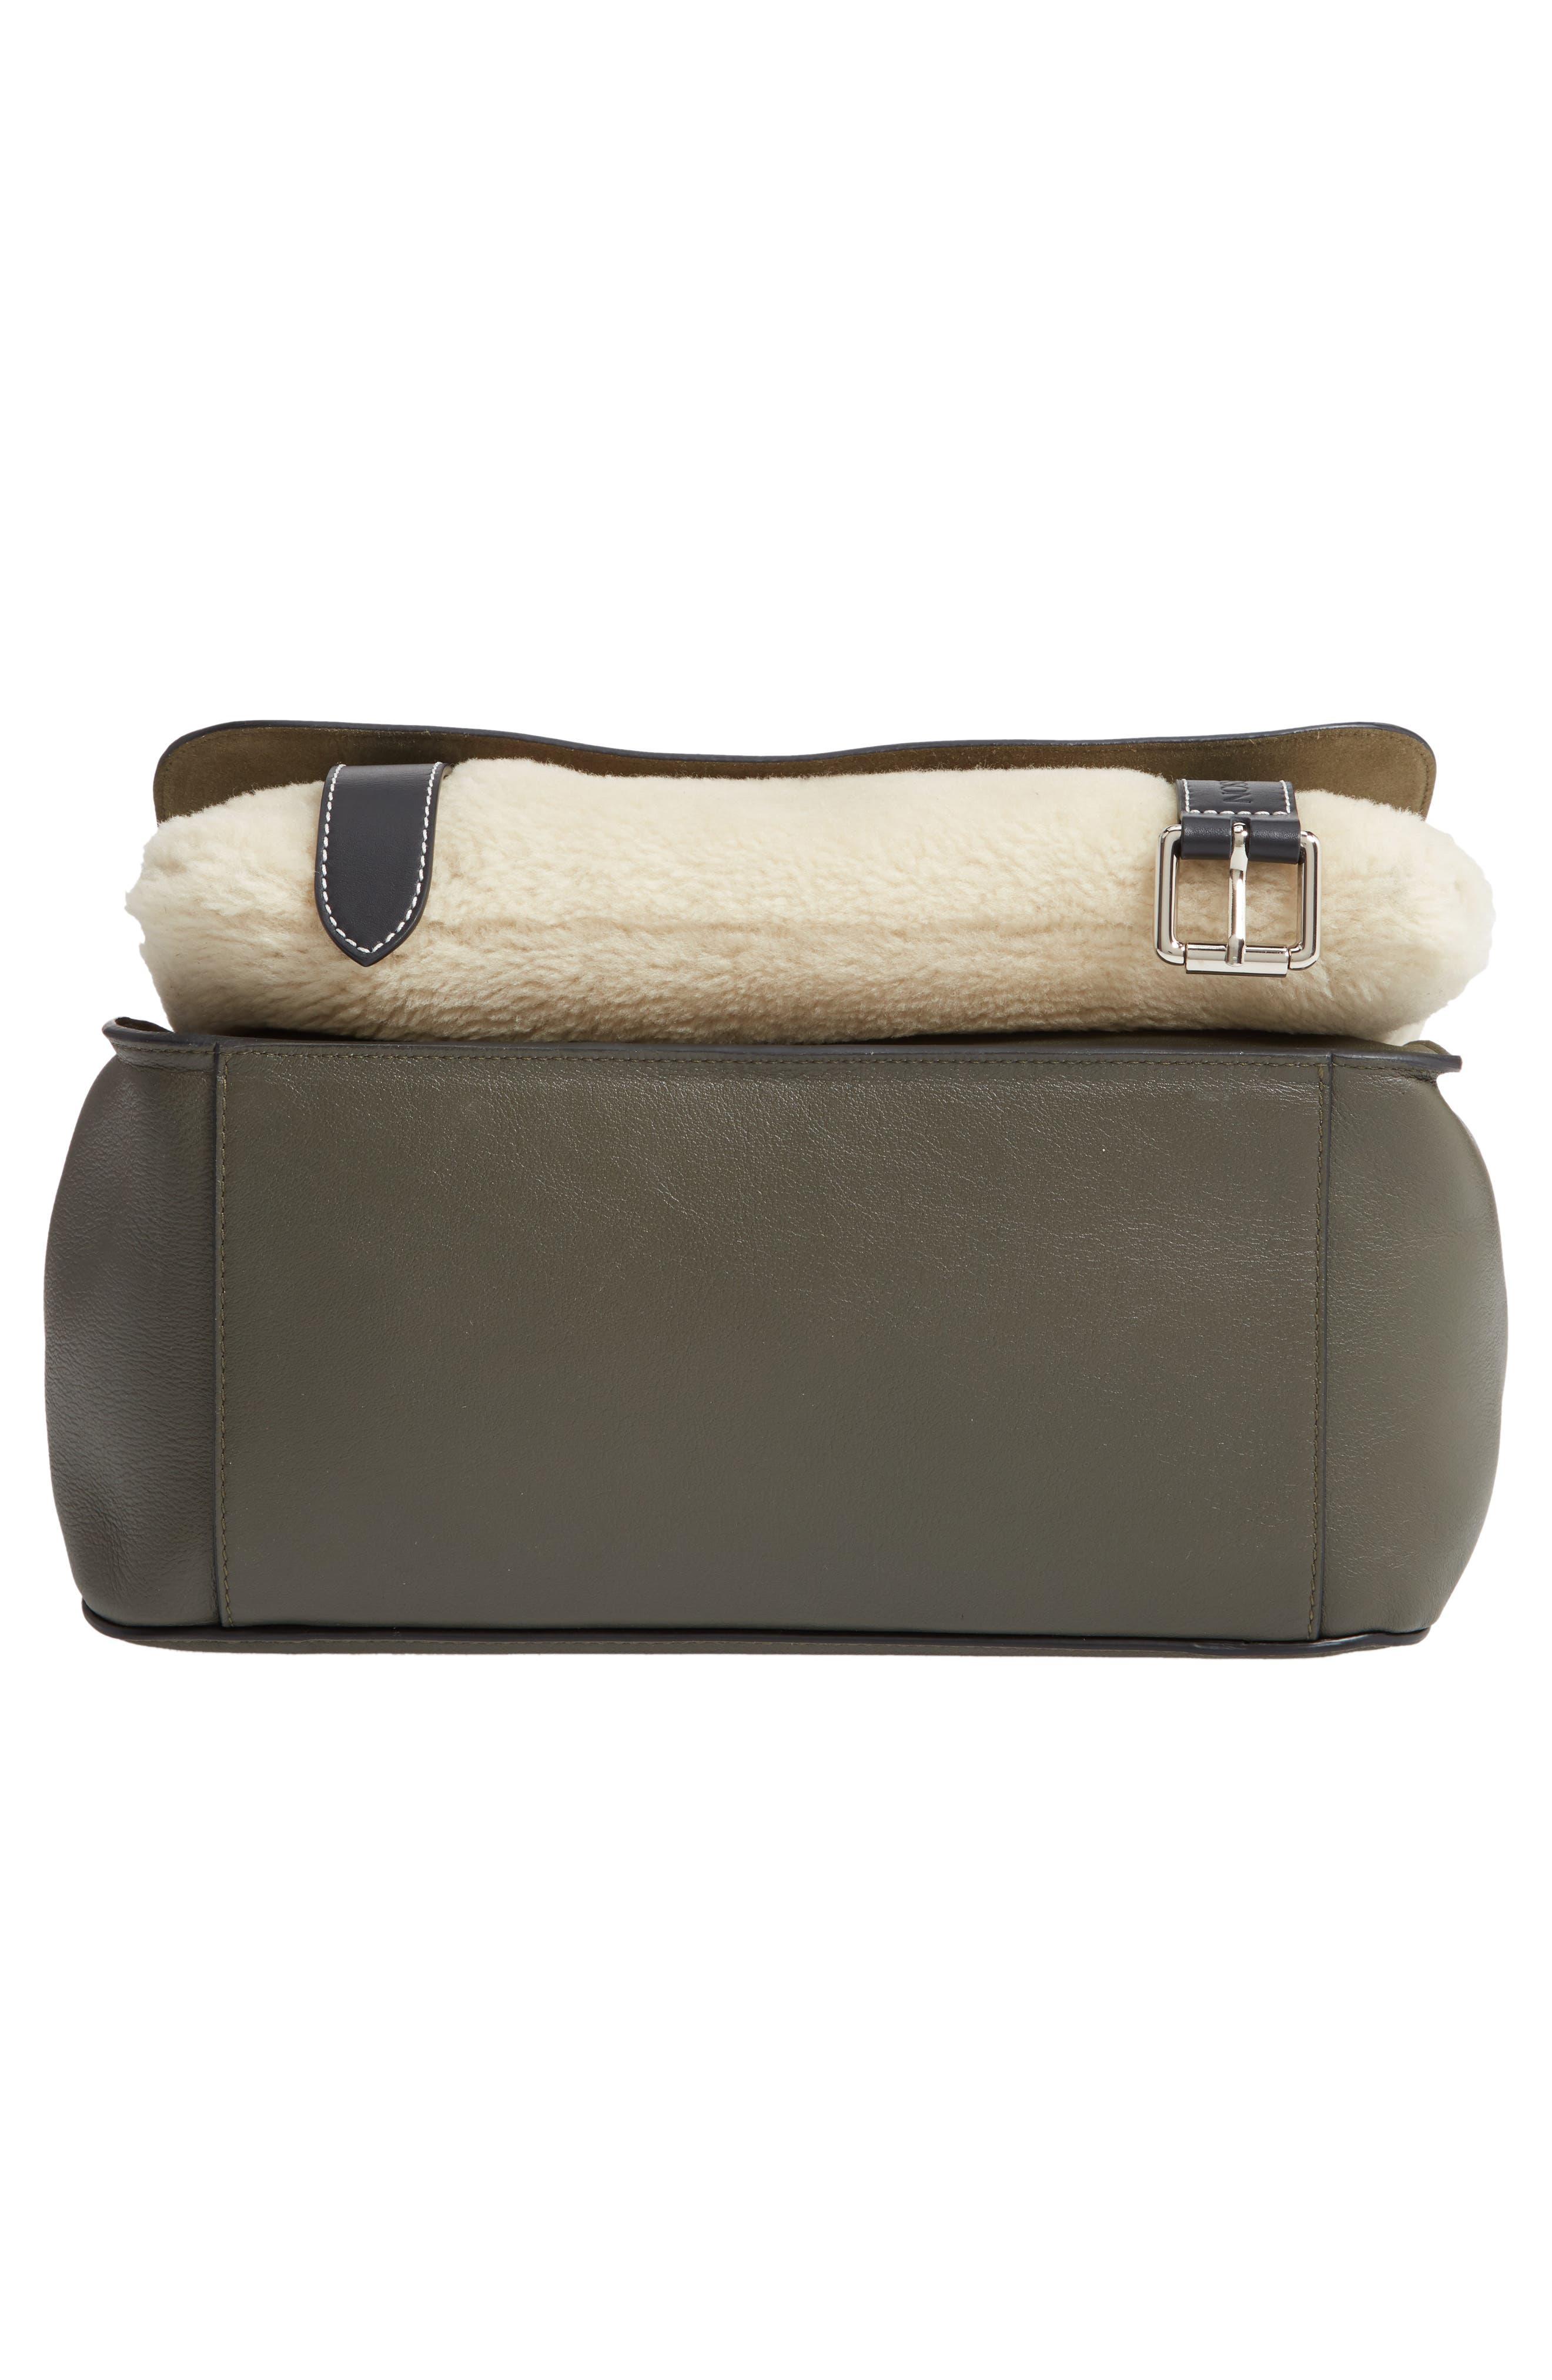 JW ANDERSON,                             Large Disc Leather & Genuine Shearling Satchel,                             Alternate thumbnail 6, color,                             KHAKI